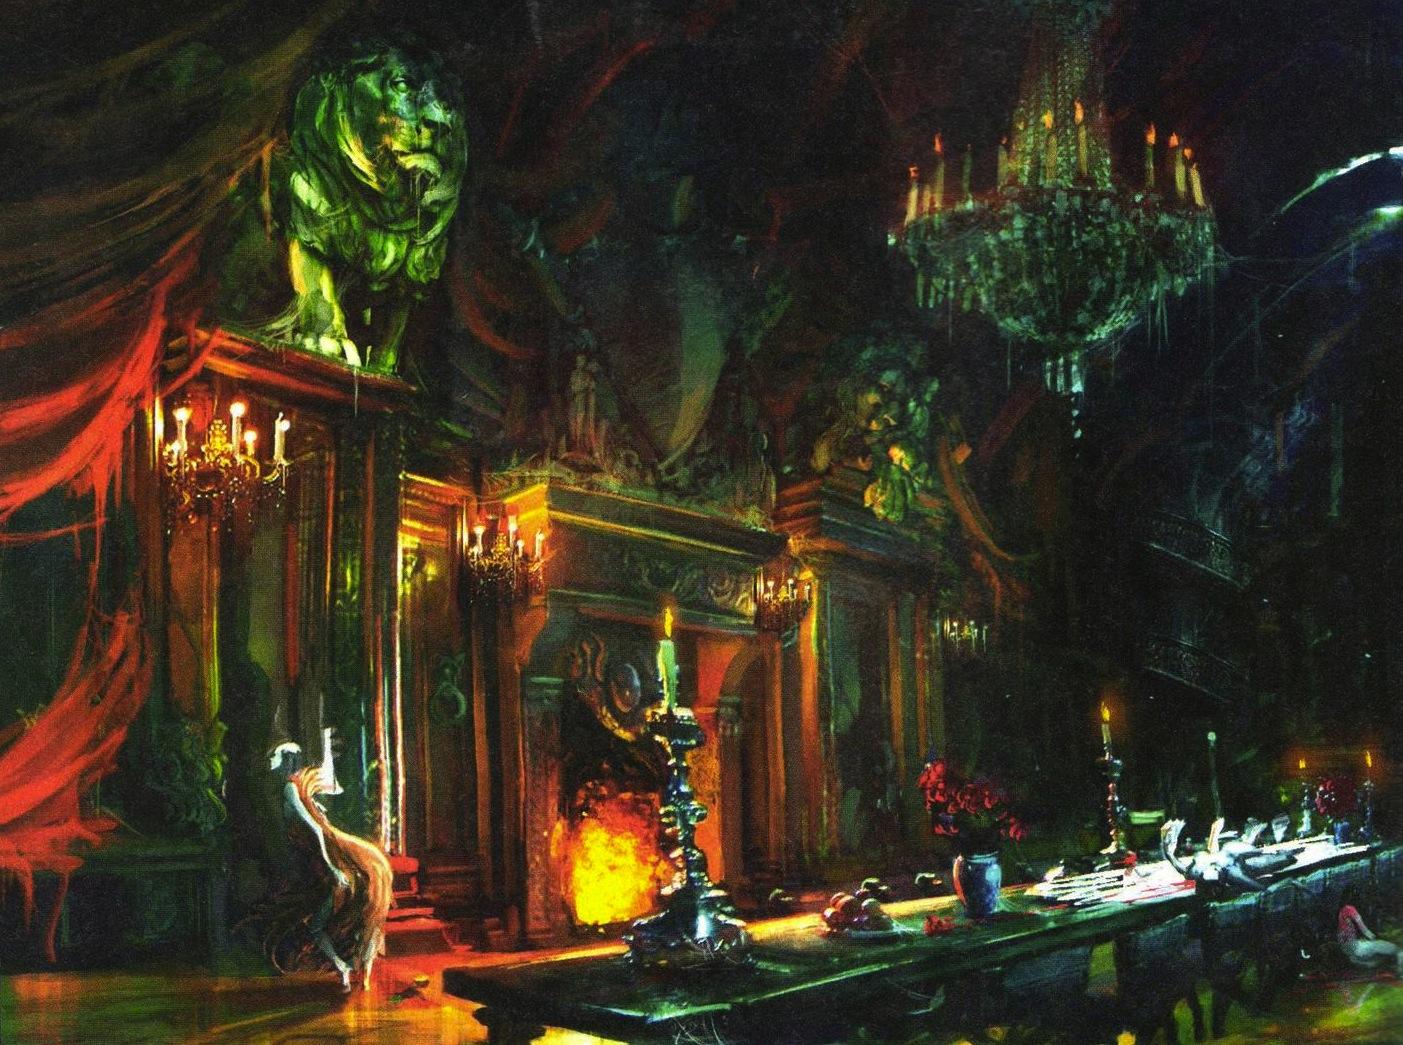 Castlevania-LordsofShadow-MirrorofFate 3DS Div 008